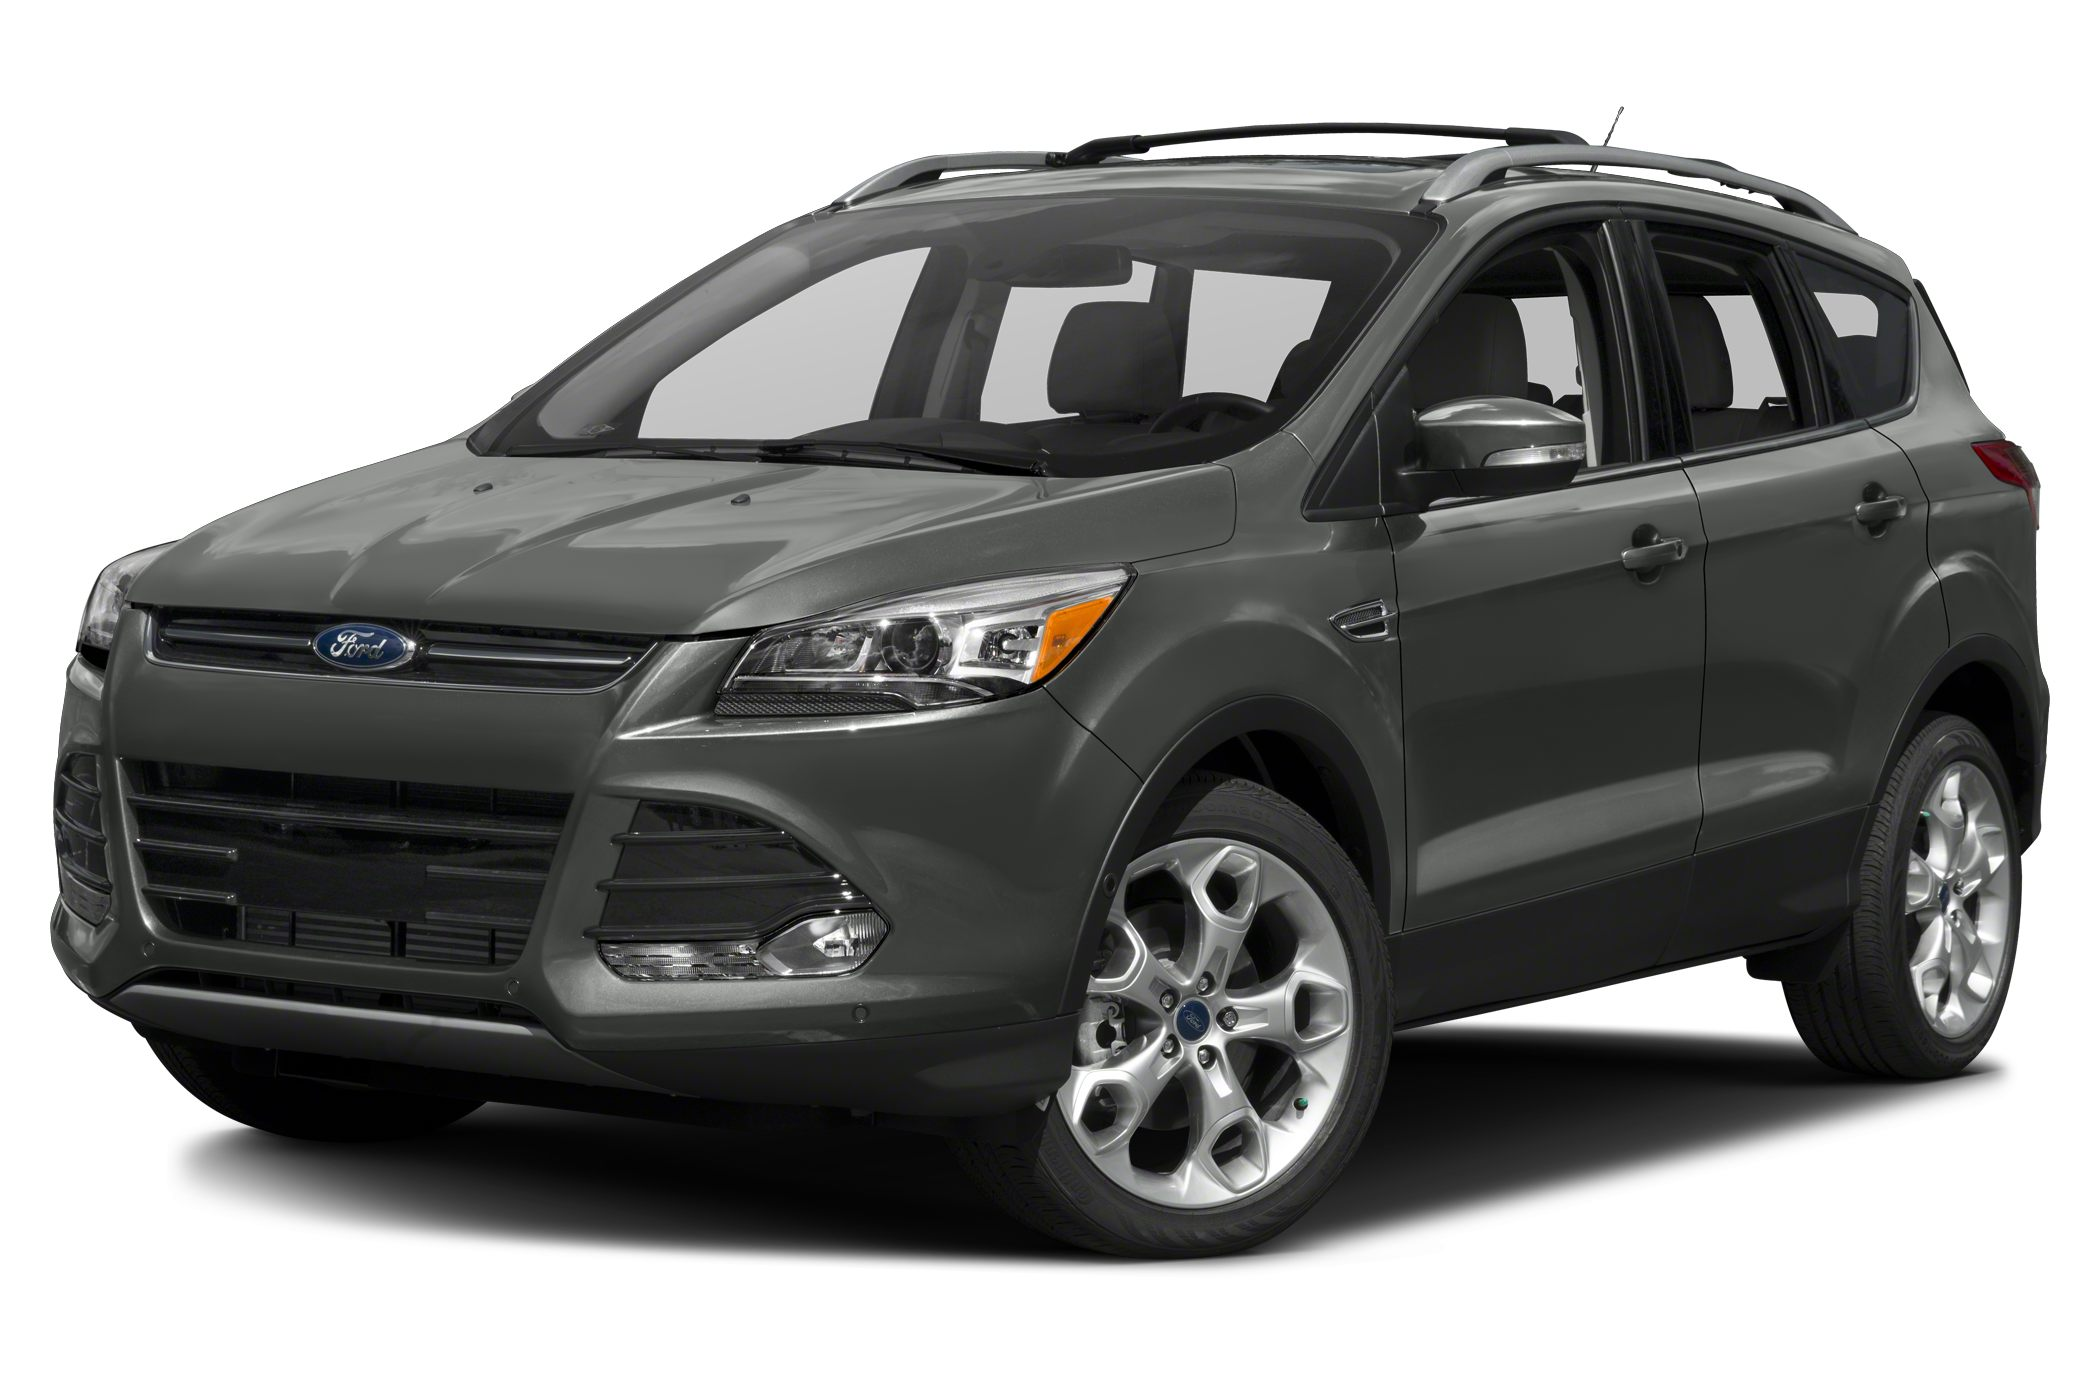 Anium 4dr 4x4 2016 Ford Escape Photos